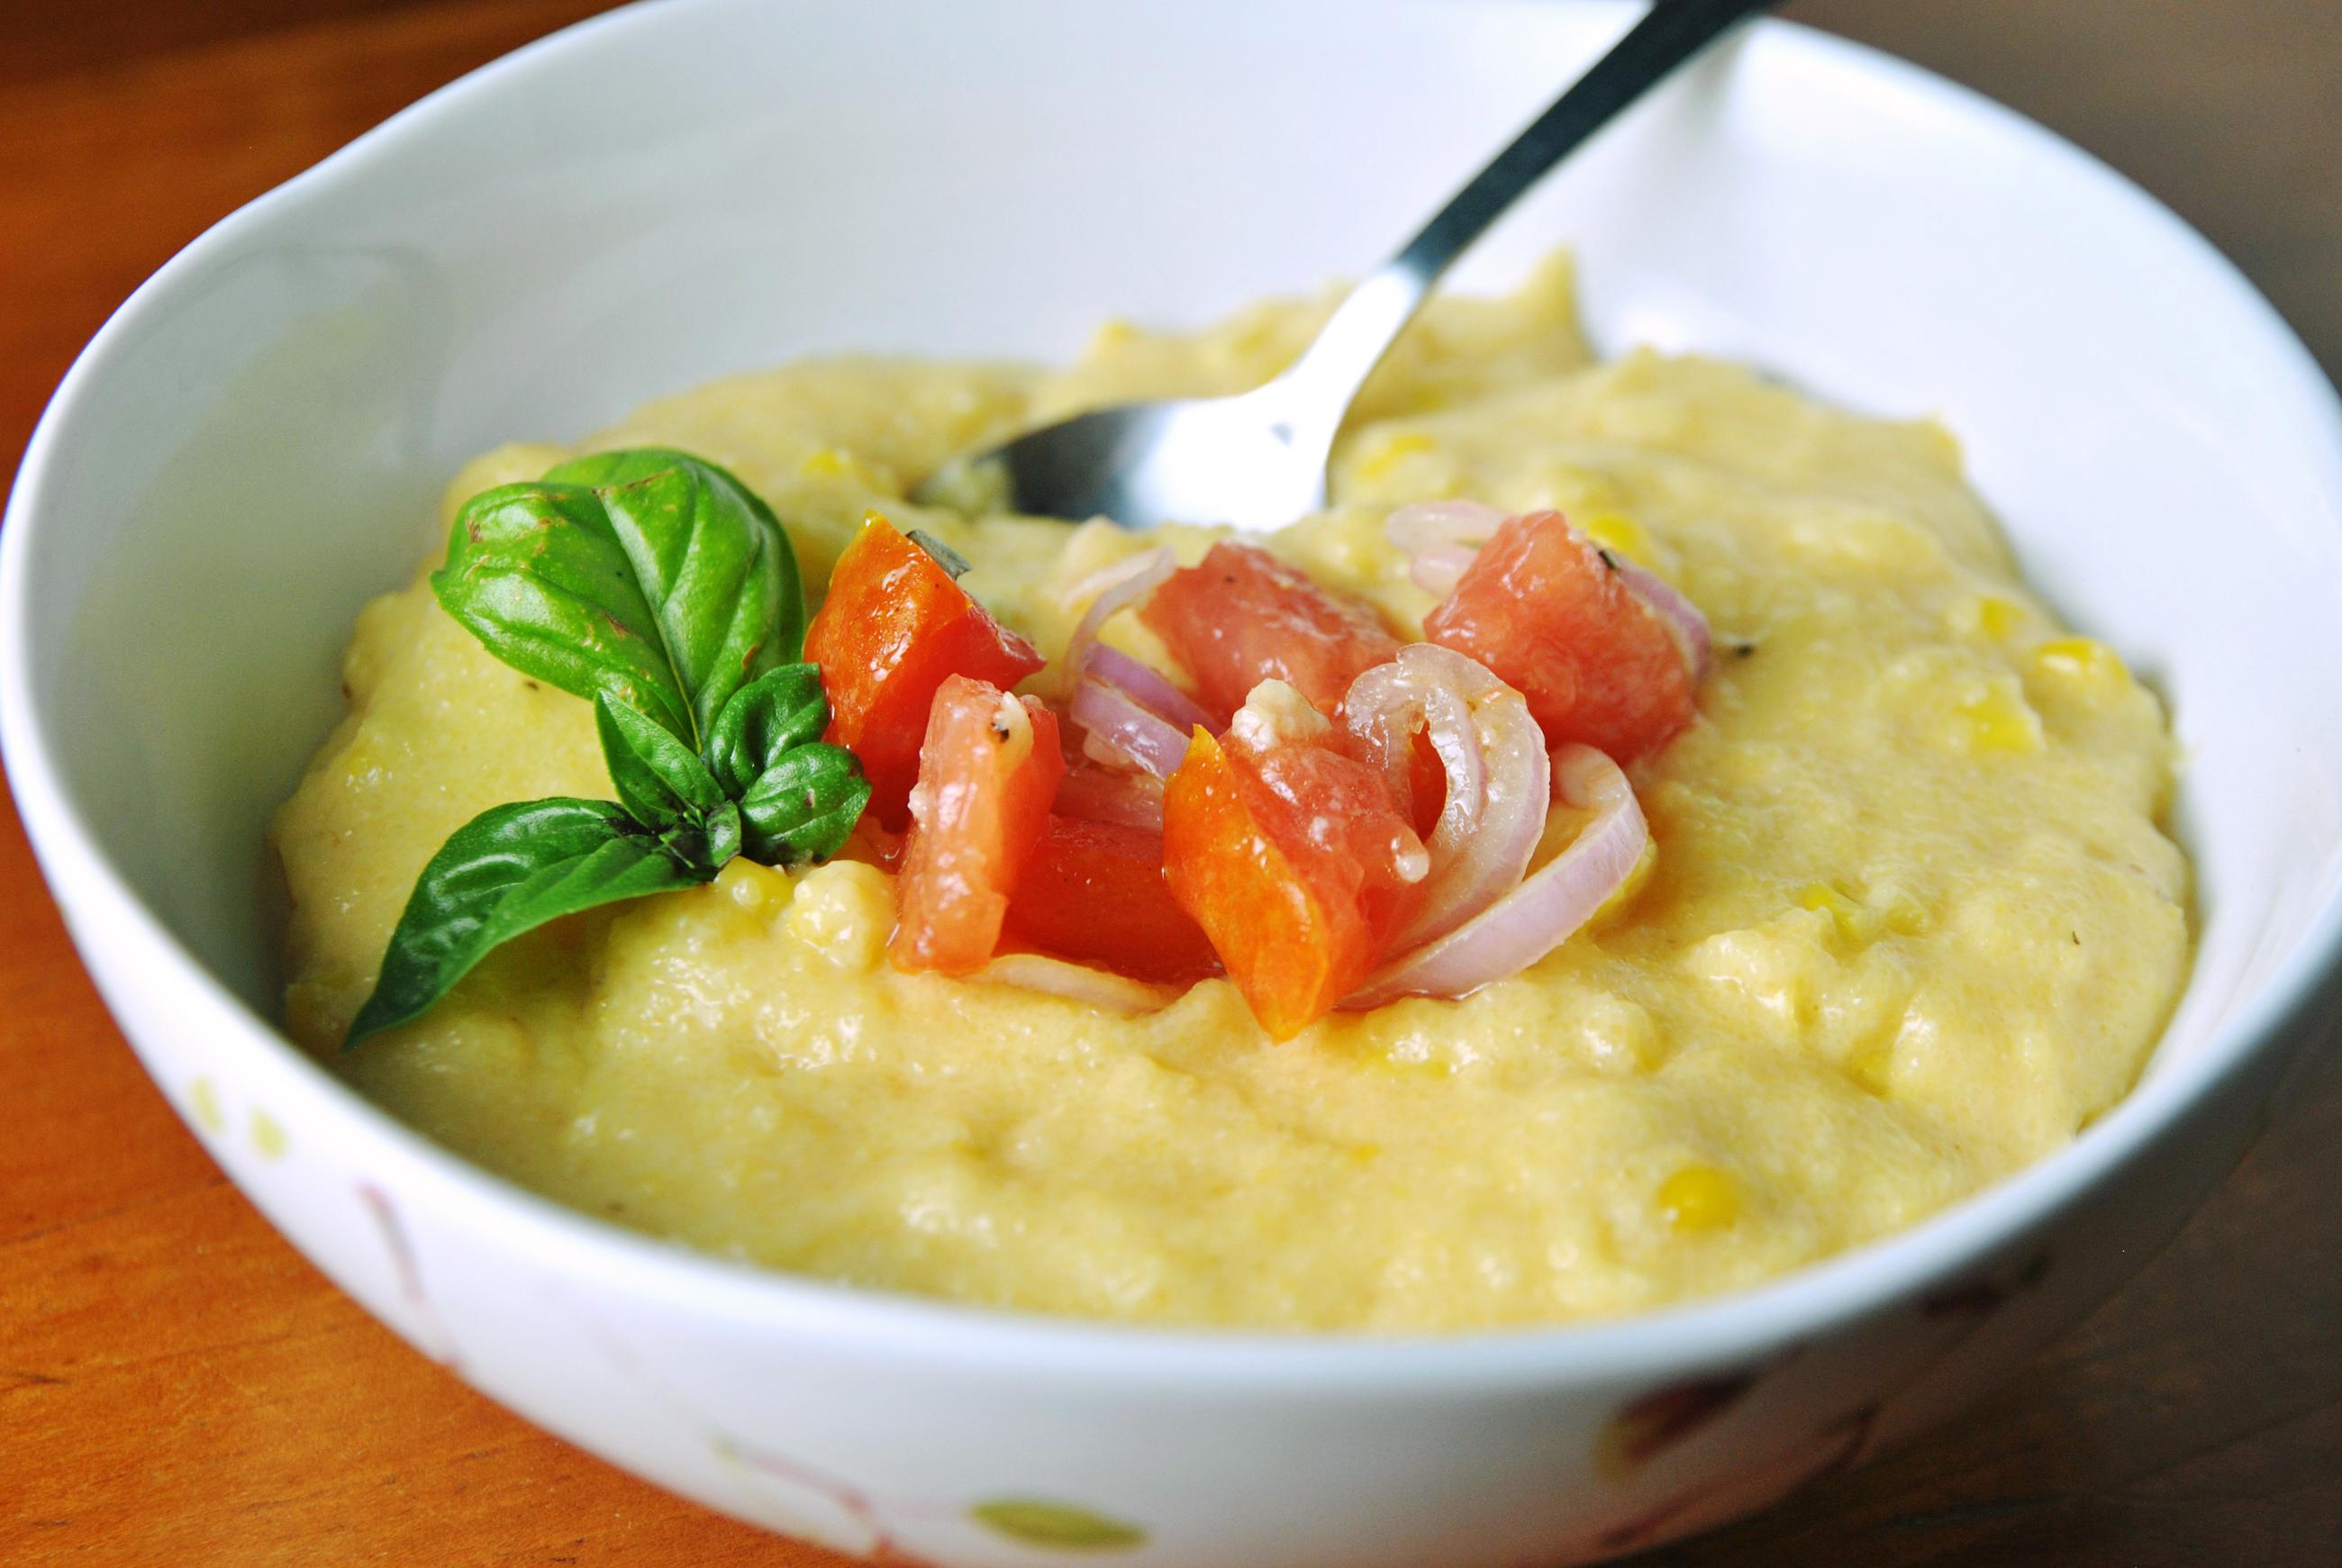 ... SLUG: LETSEAT0808 CAPTION: Corn Polenta with Tomato Salsa